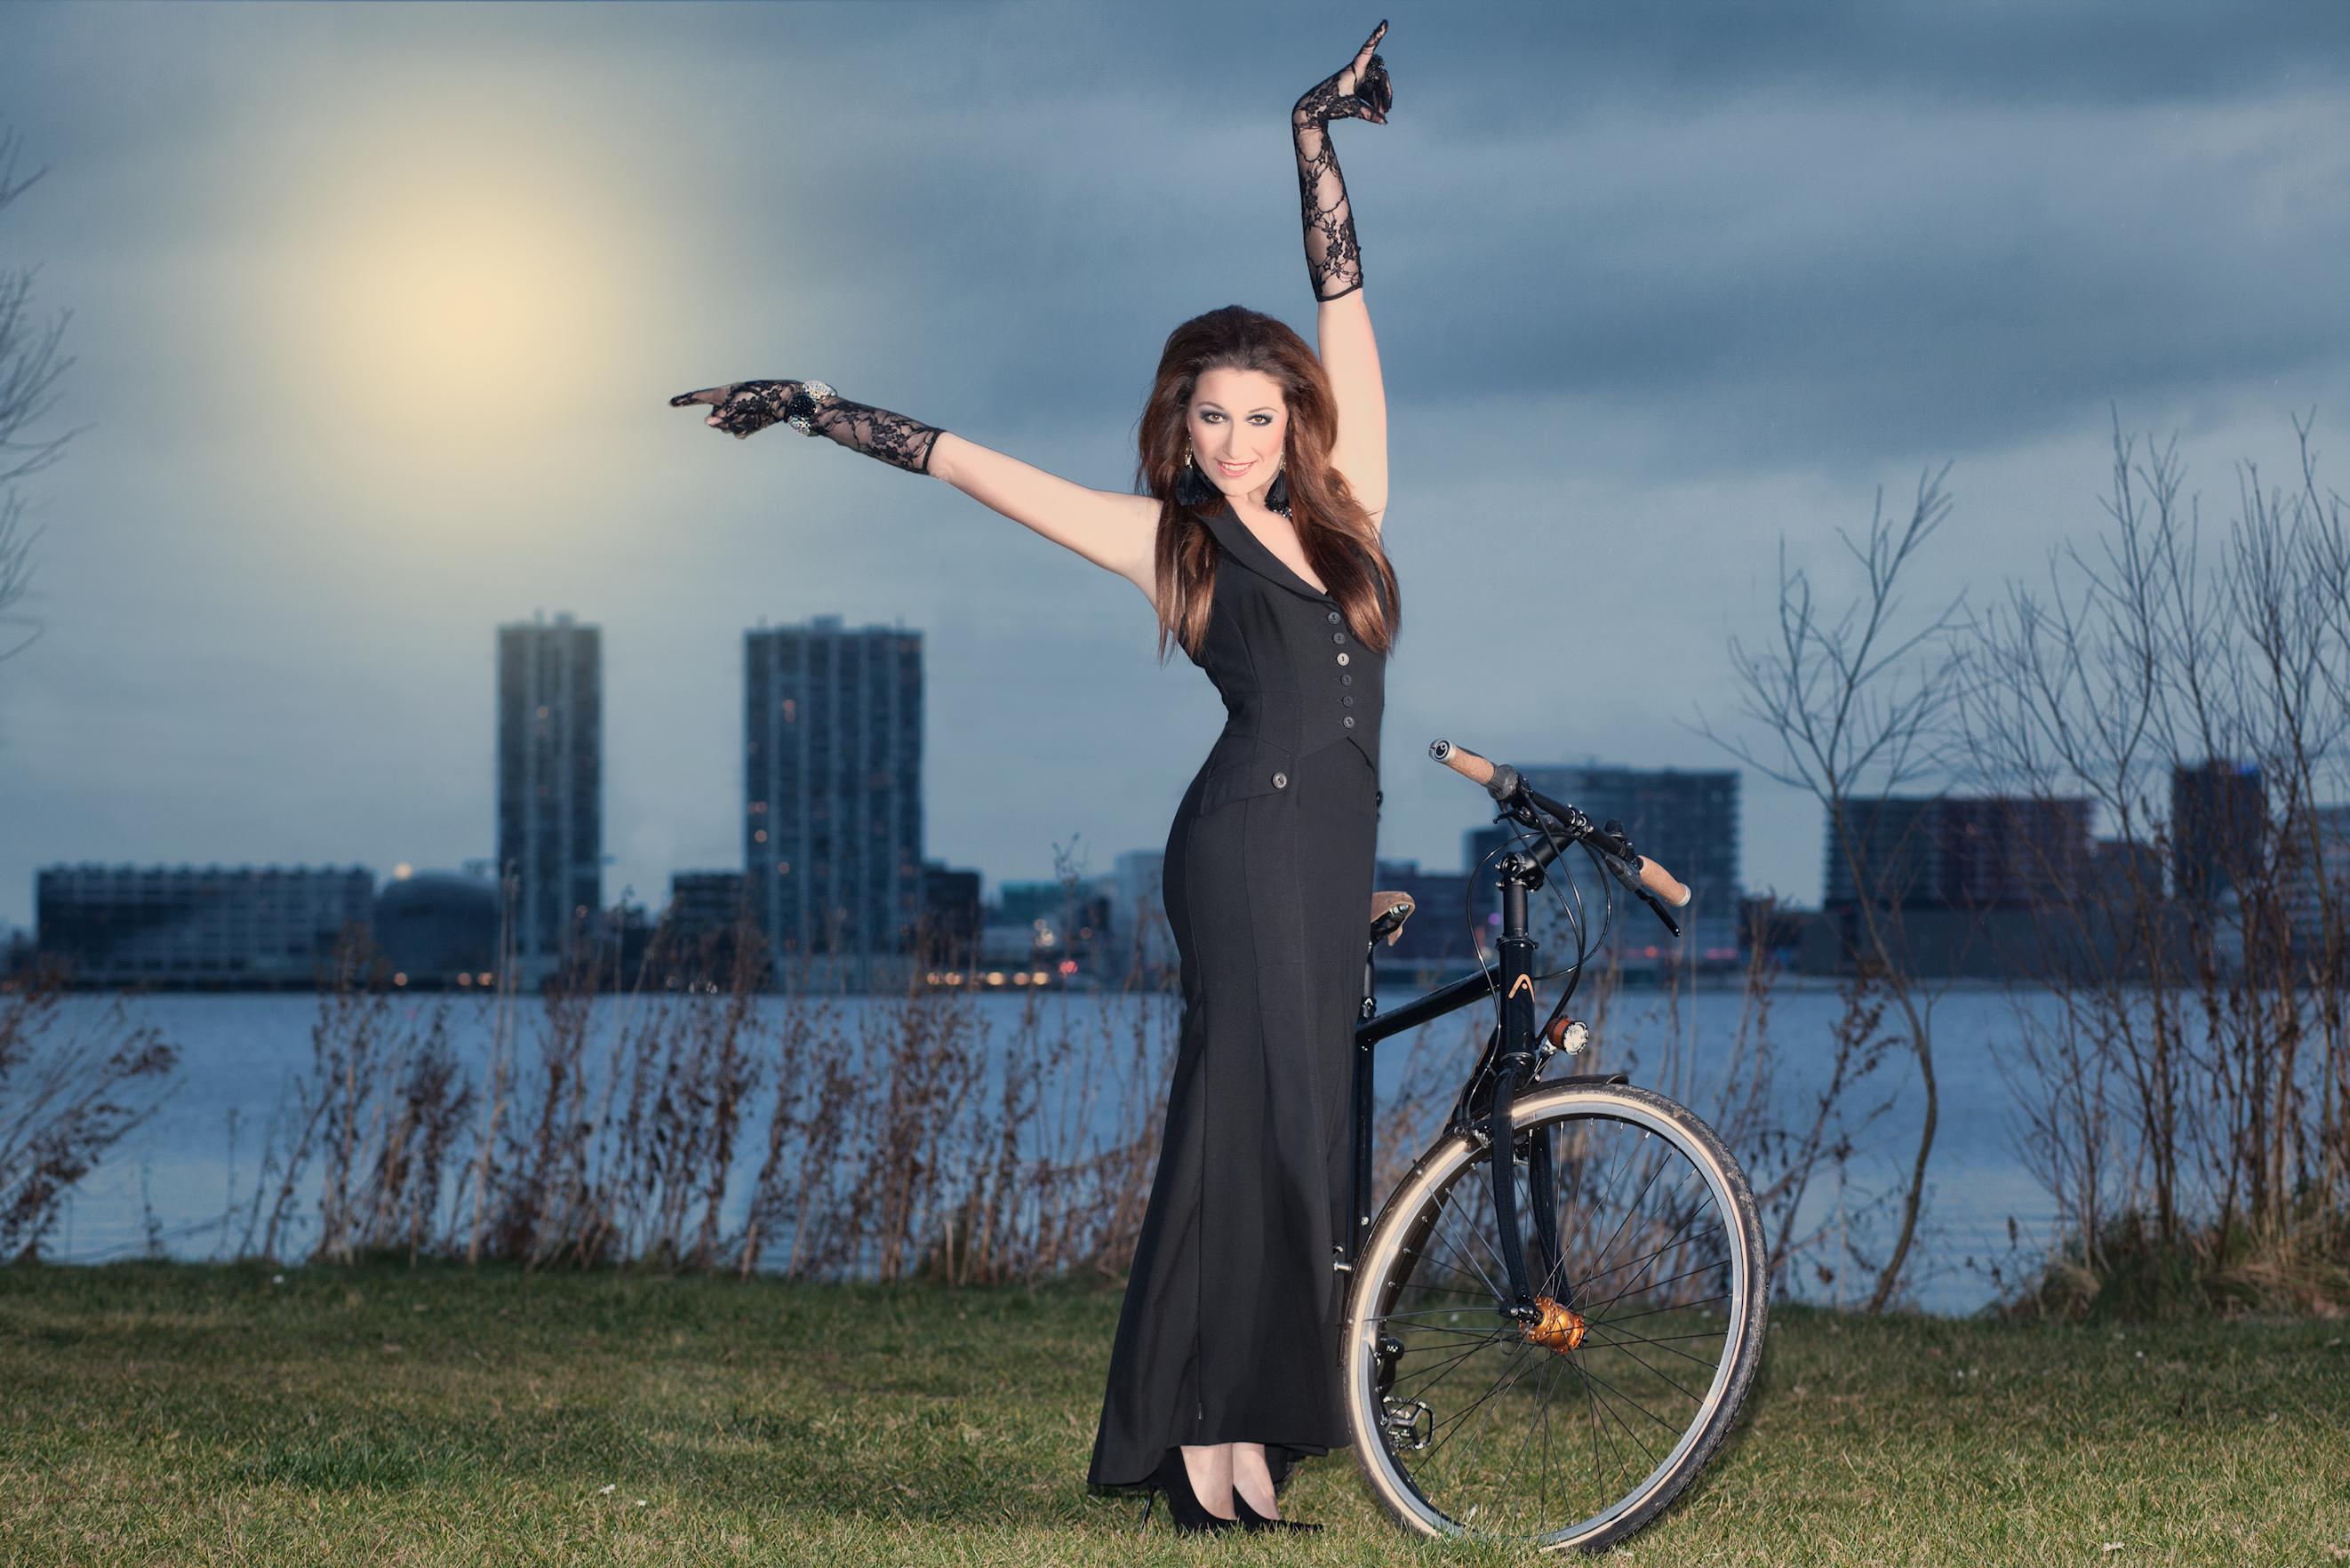 Kalender Miss Almere verkiezing